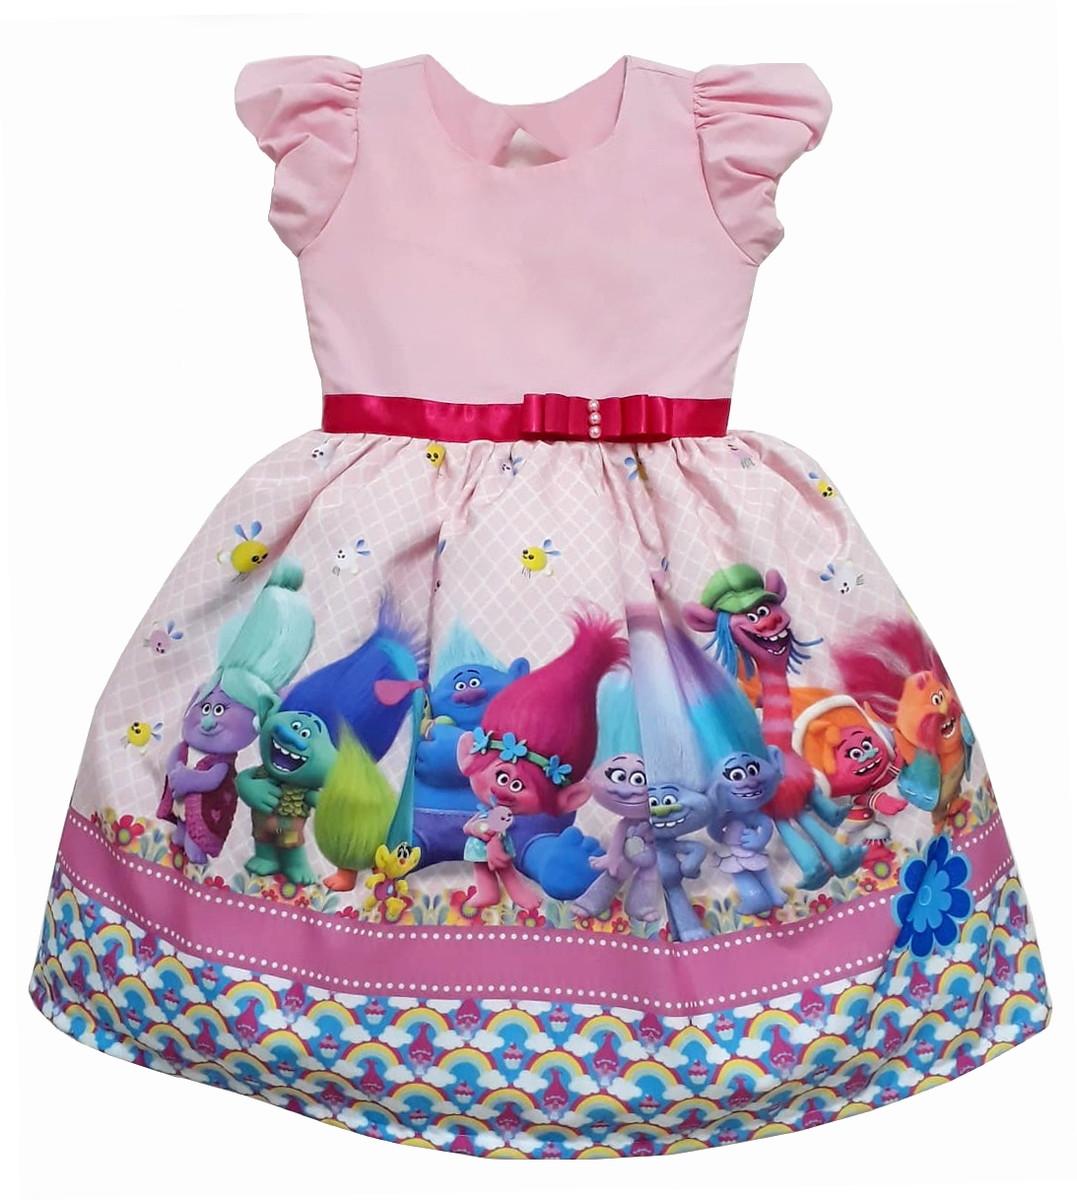 Vestido Desenho Trolls Festa Tematico Princesas No Elo7 Outlet